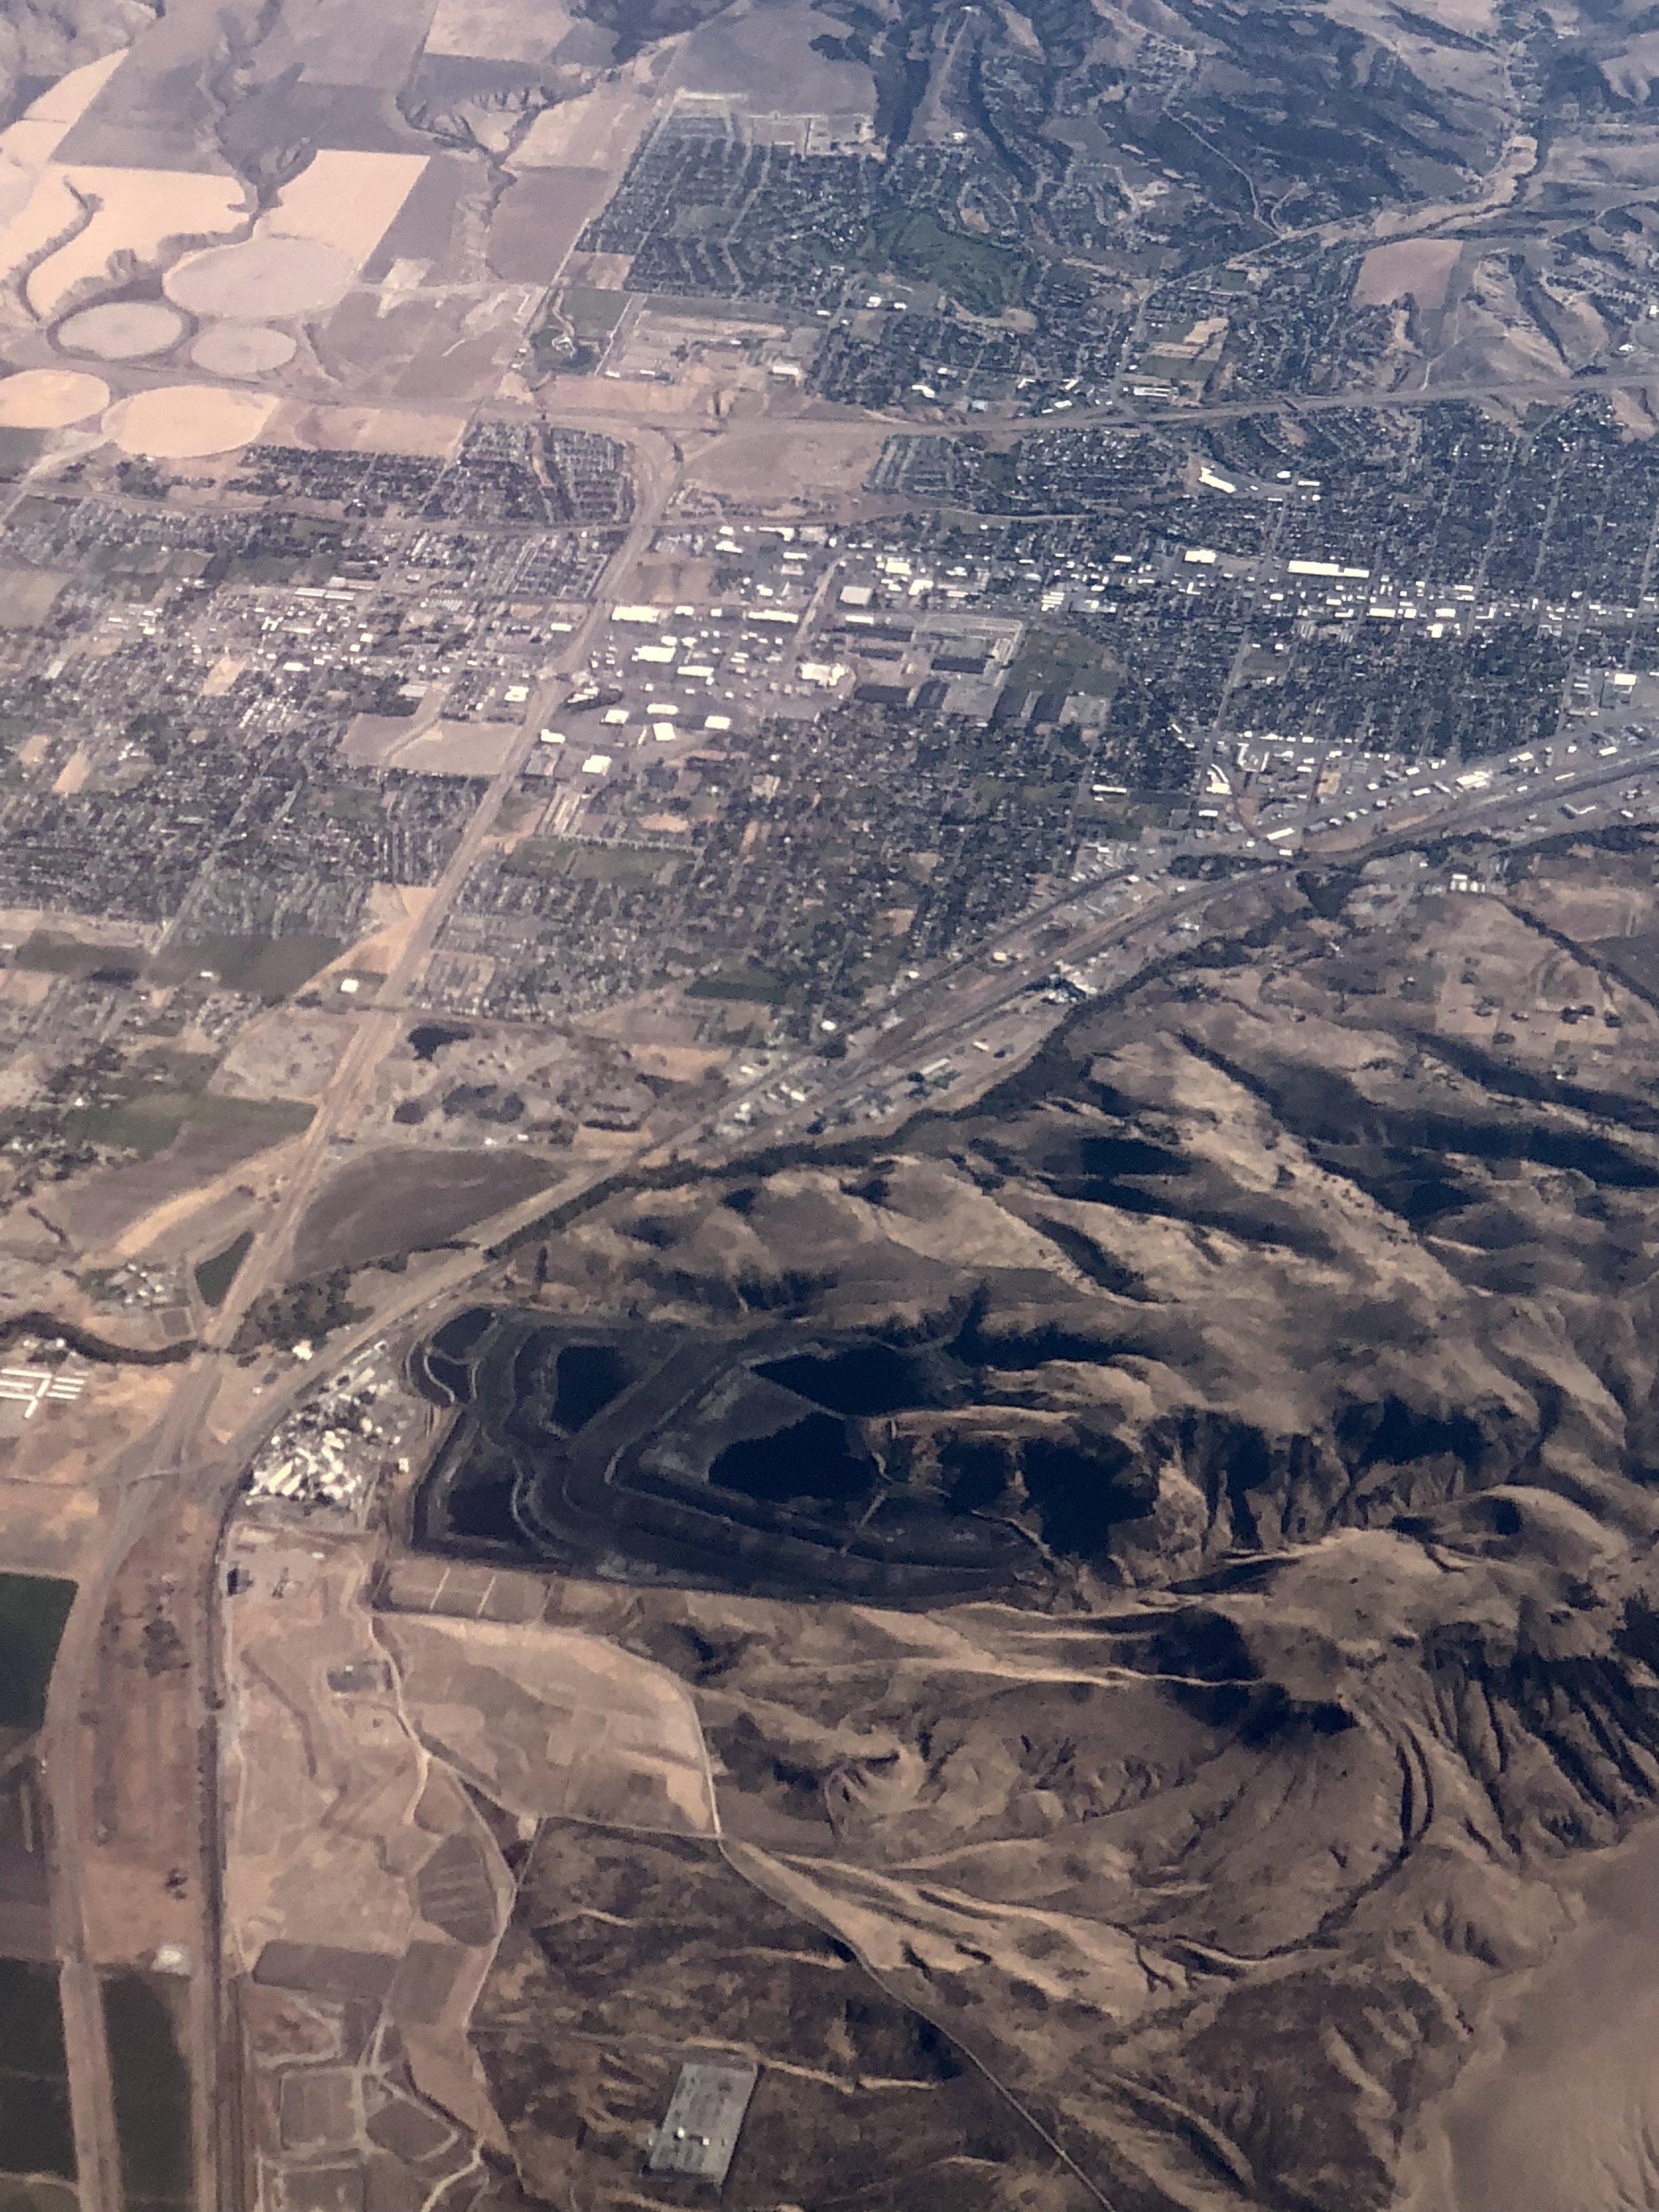 Phosphate fertilizer manufacturing plant in Pocatello, Idaho